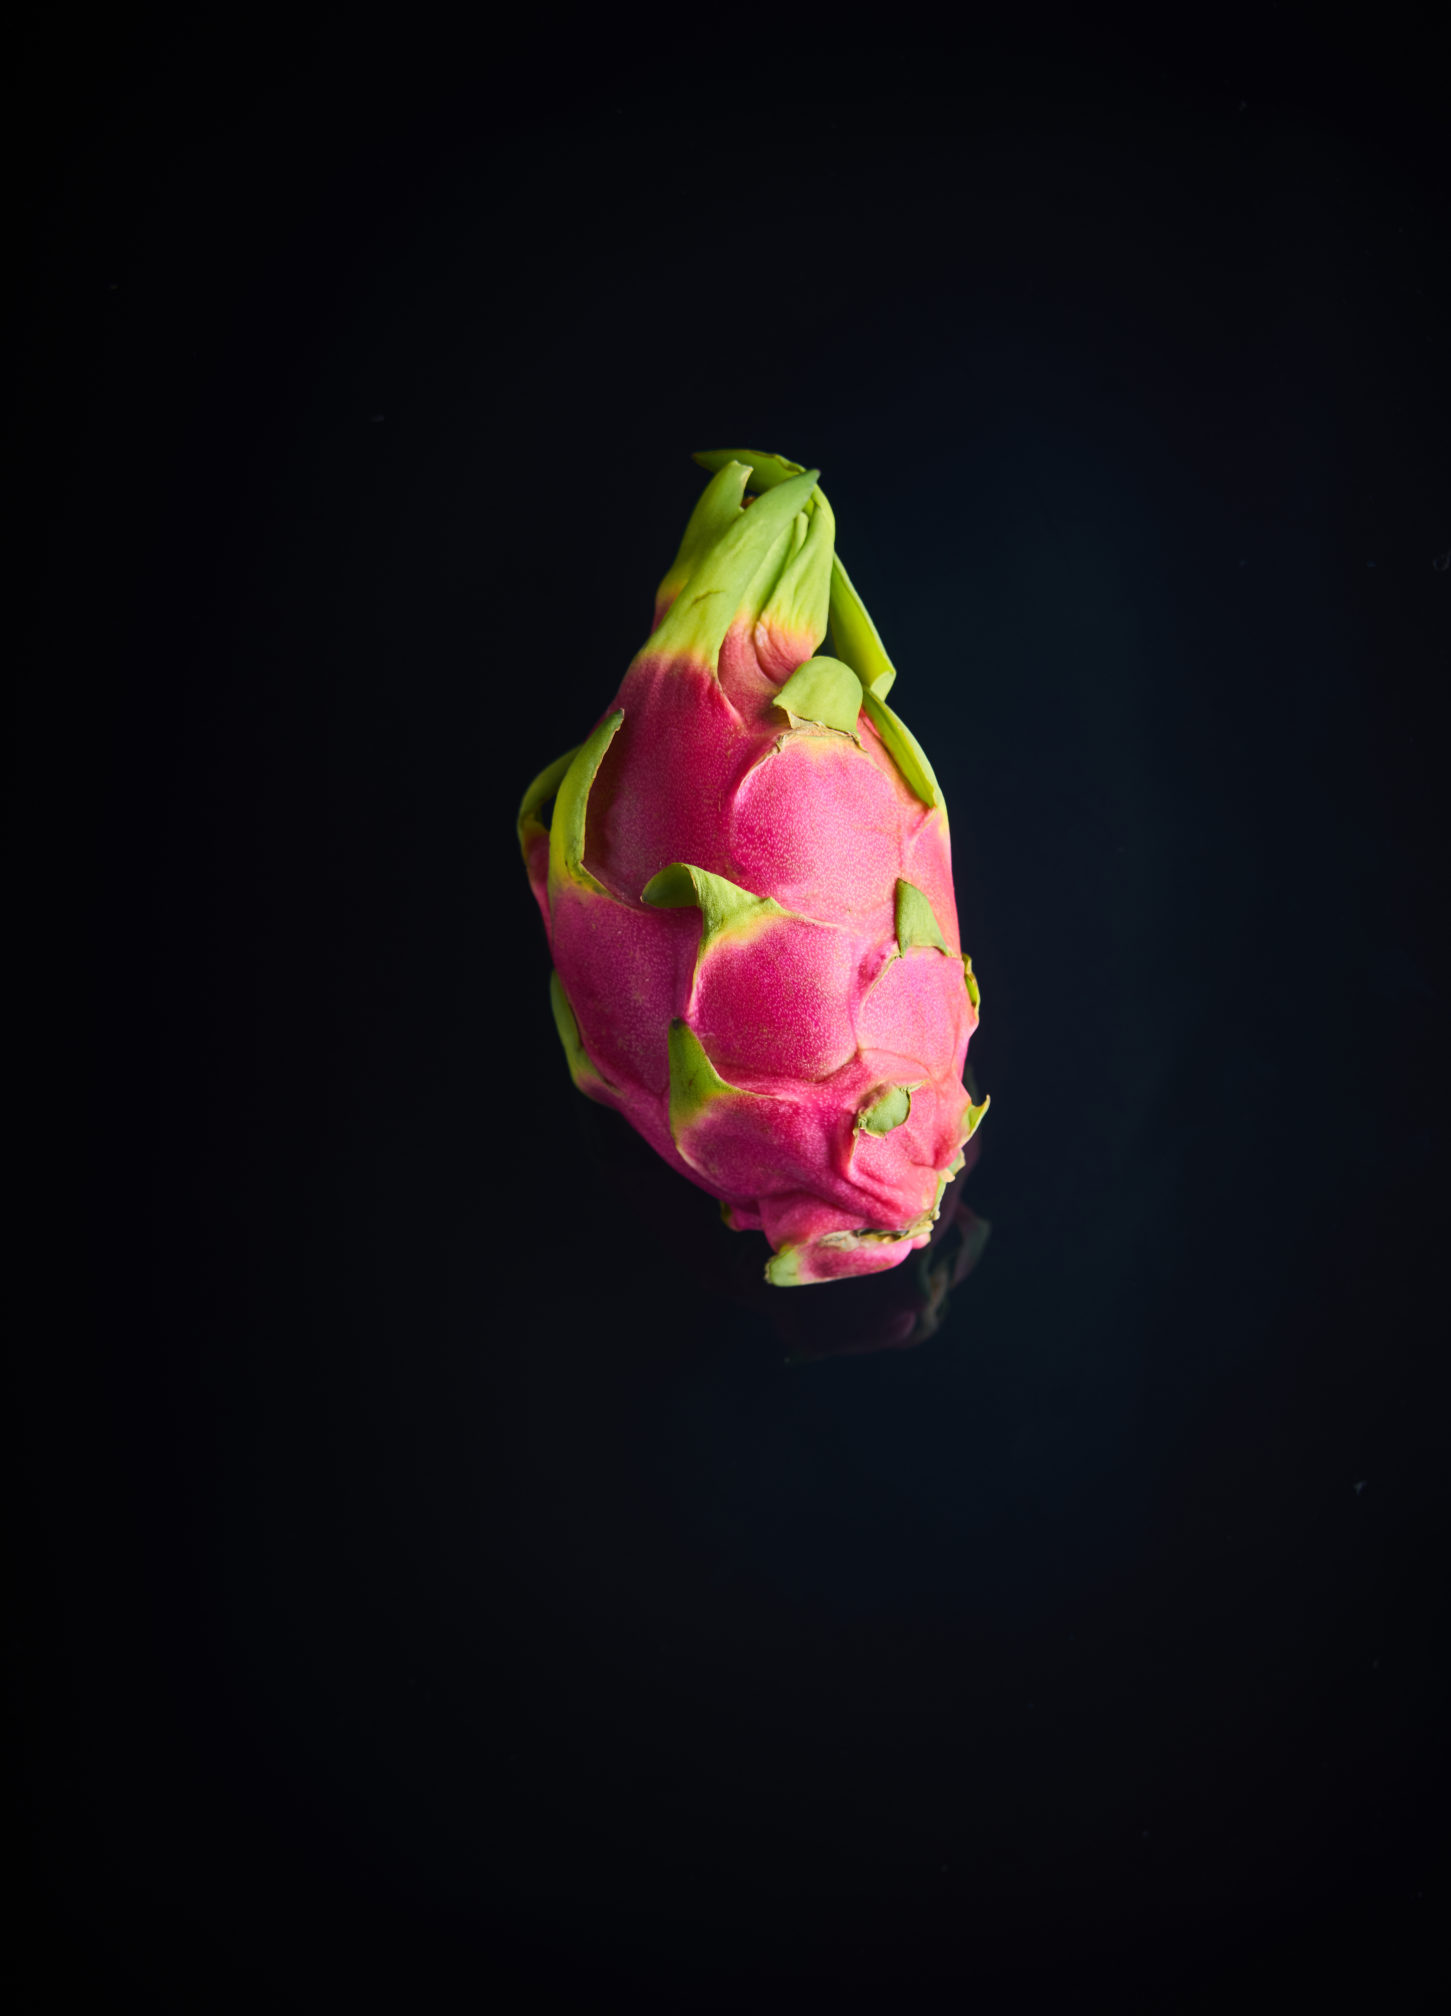 capexo-lilot-fruits-exotique-pitahaya-rouge-Thaïlande-Vietnam-Israël